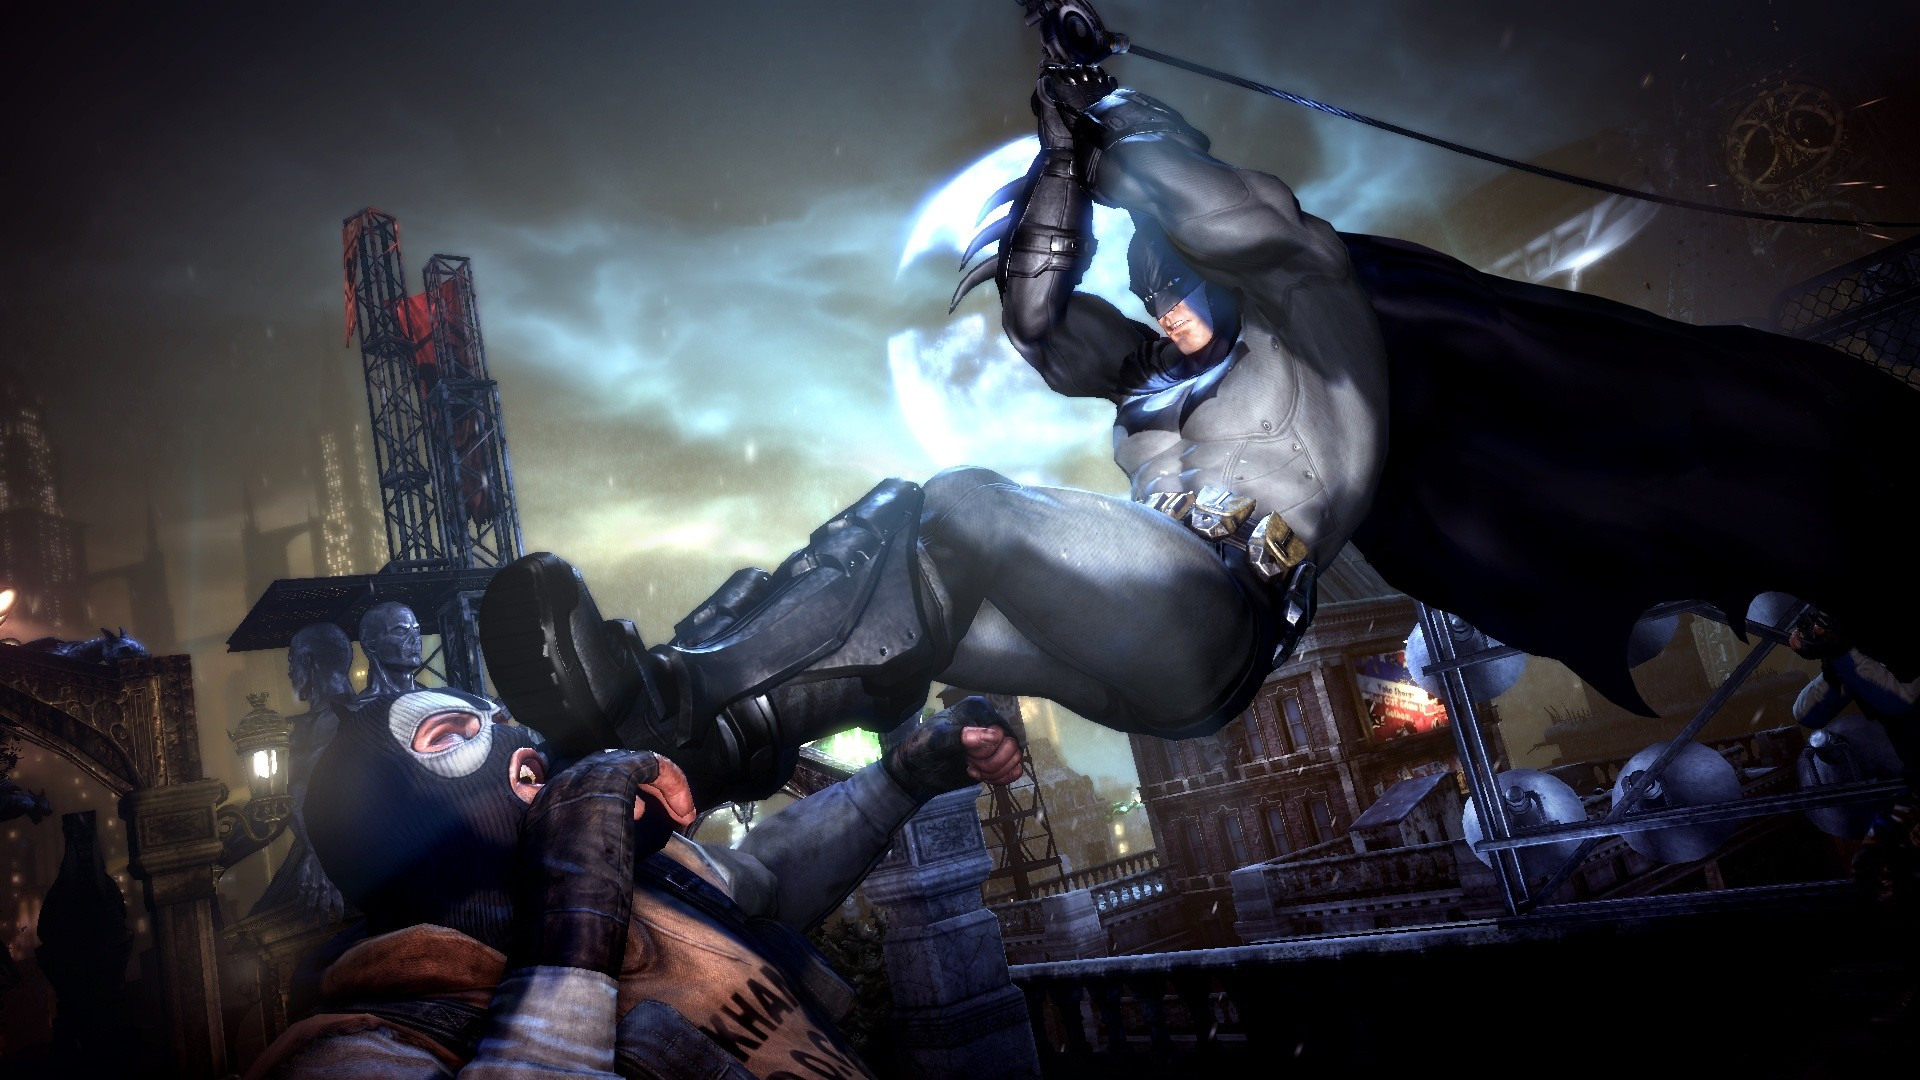 0 Batman Arkham Origins desktop wallpaper WallpaperPixel Batman City  Wallpapers Group